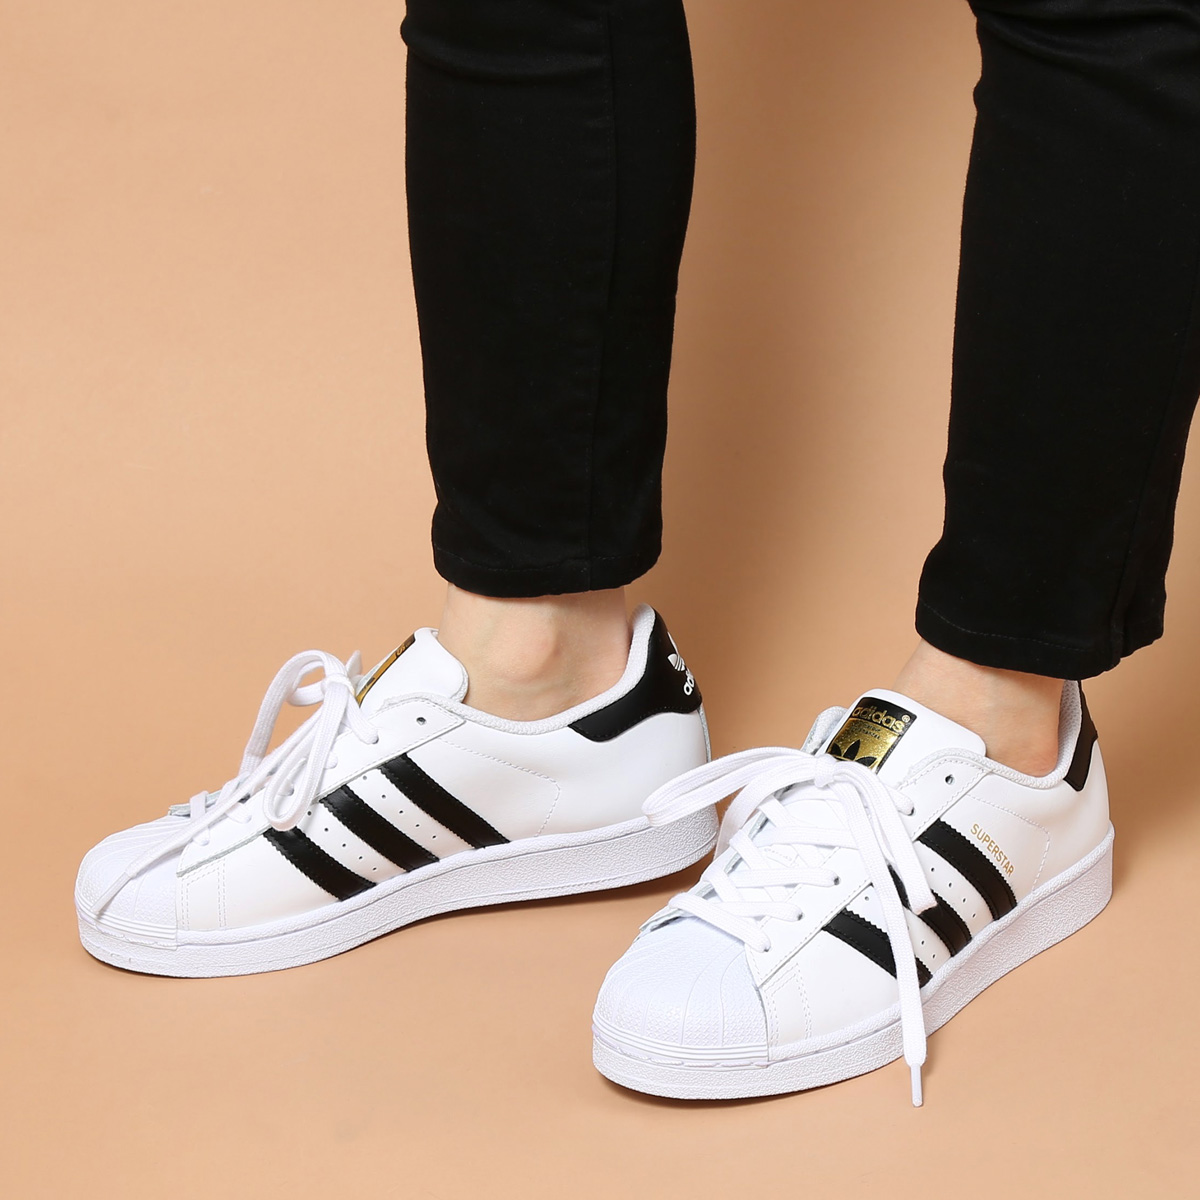 adidas Originals SUPERSTAR W【アディダス オリジナルス スーパースター ウィメンズ】Running White/Core Black/Running White【メンズ レディース スニーカー】【定番】 CRYOVR